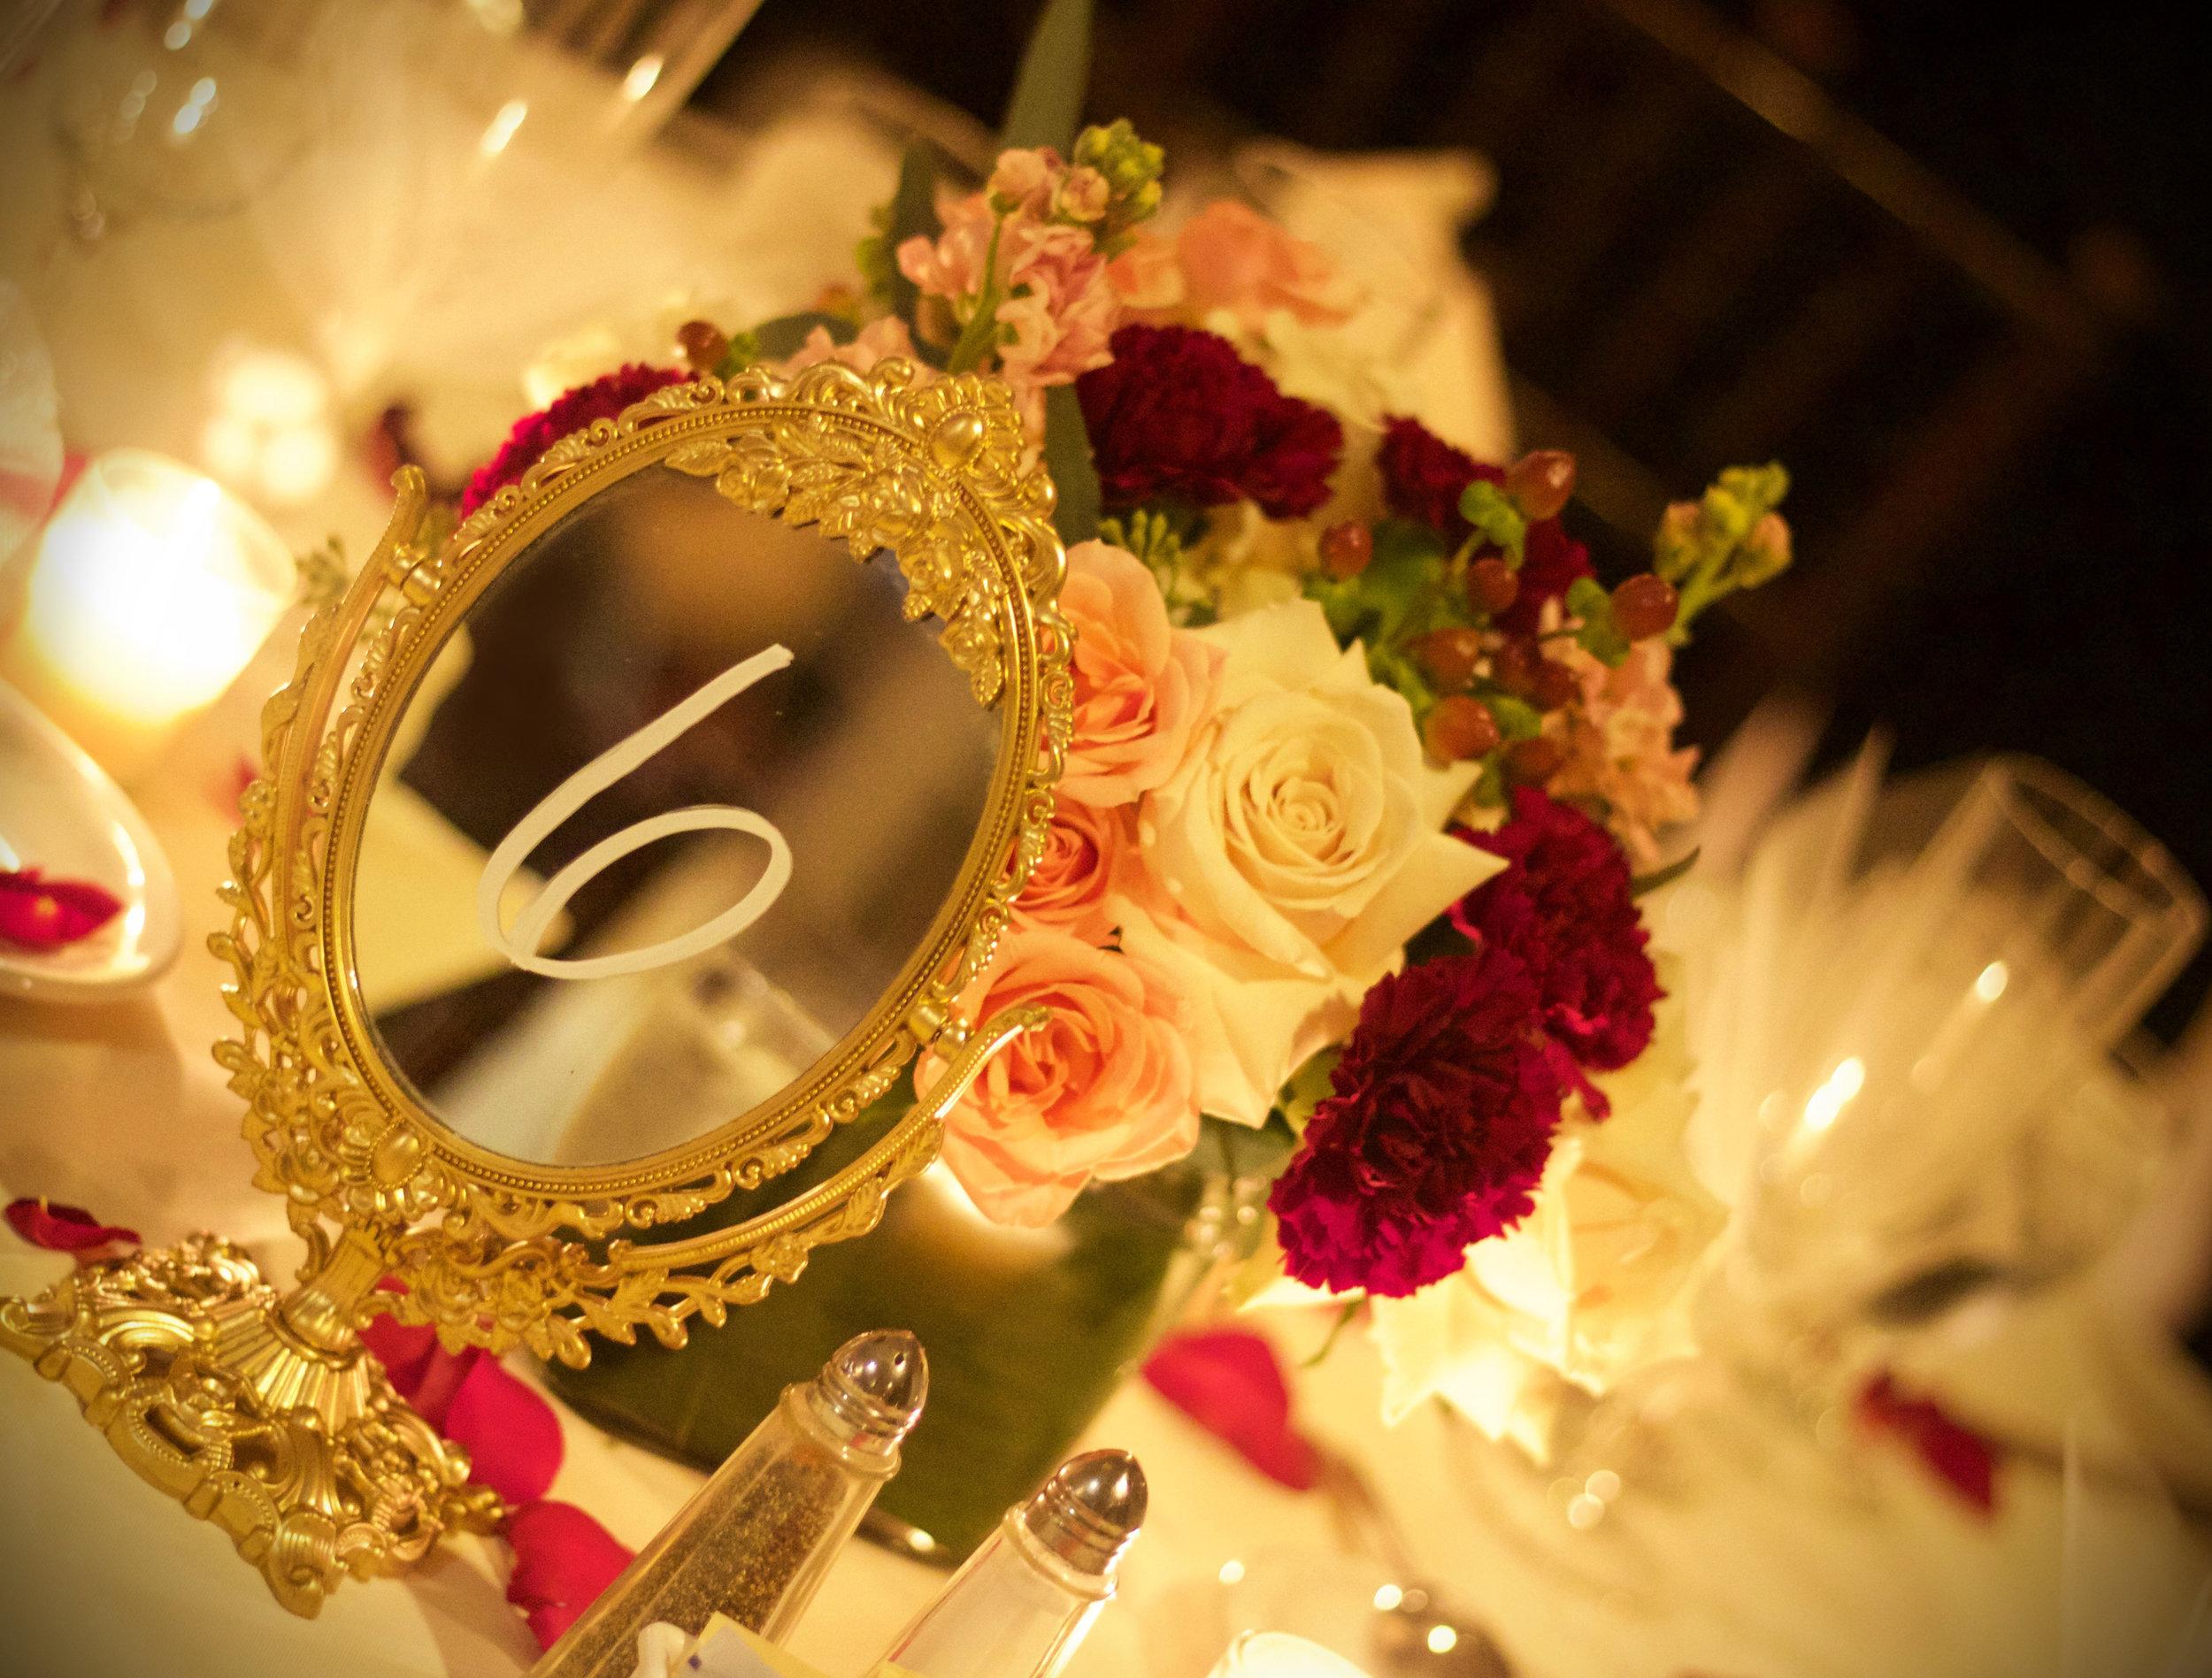 flowers_centerpiece.jpg